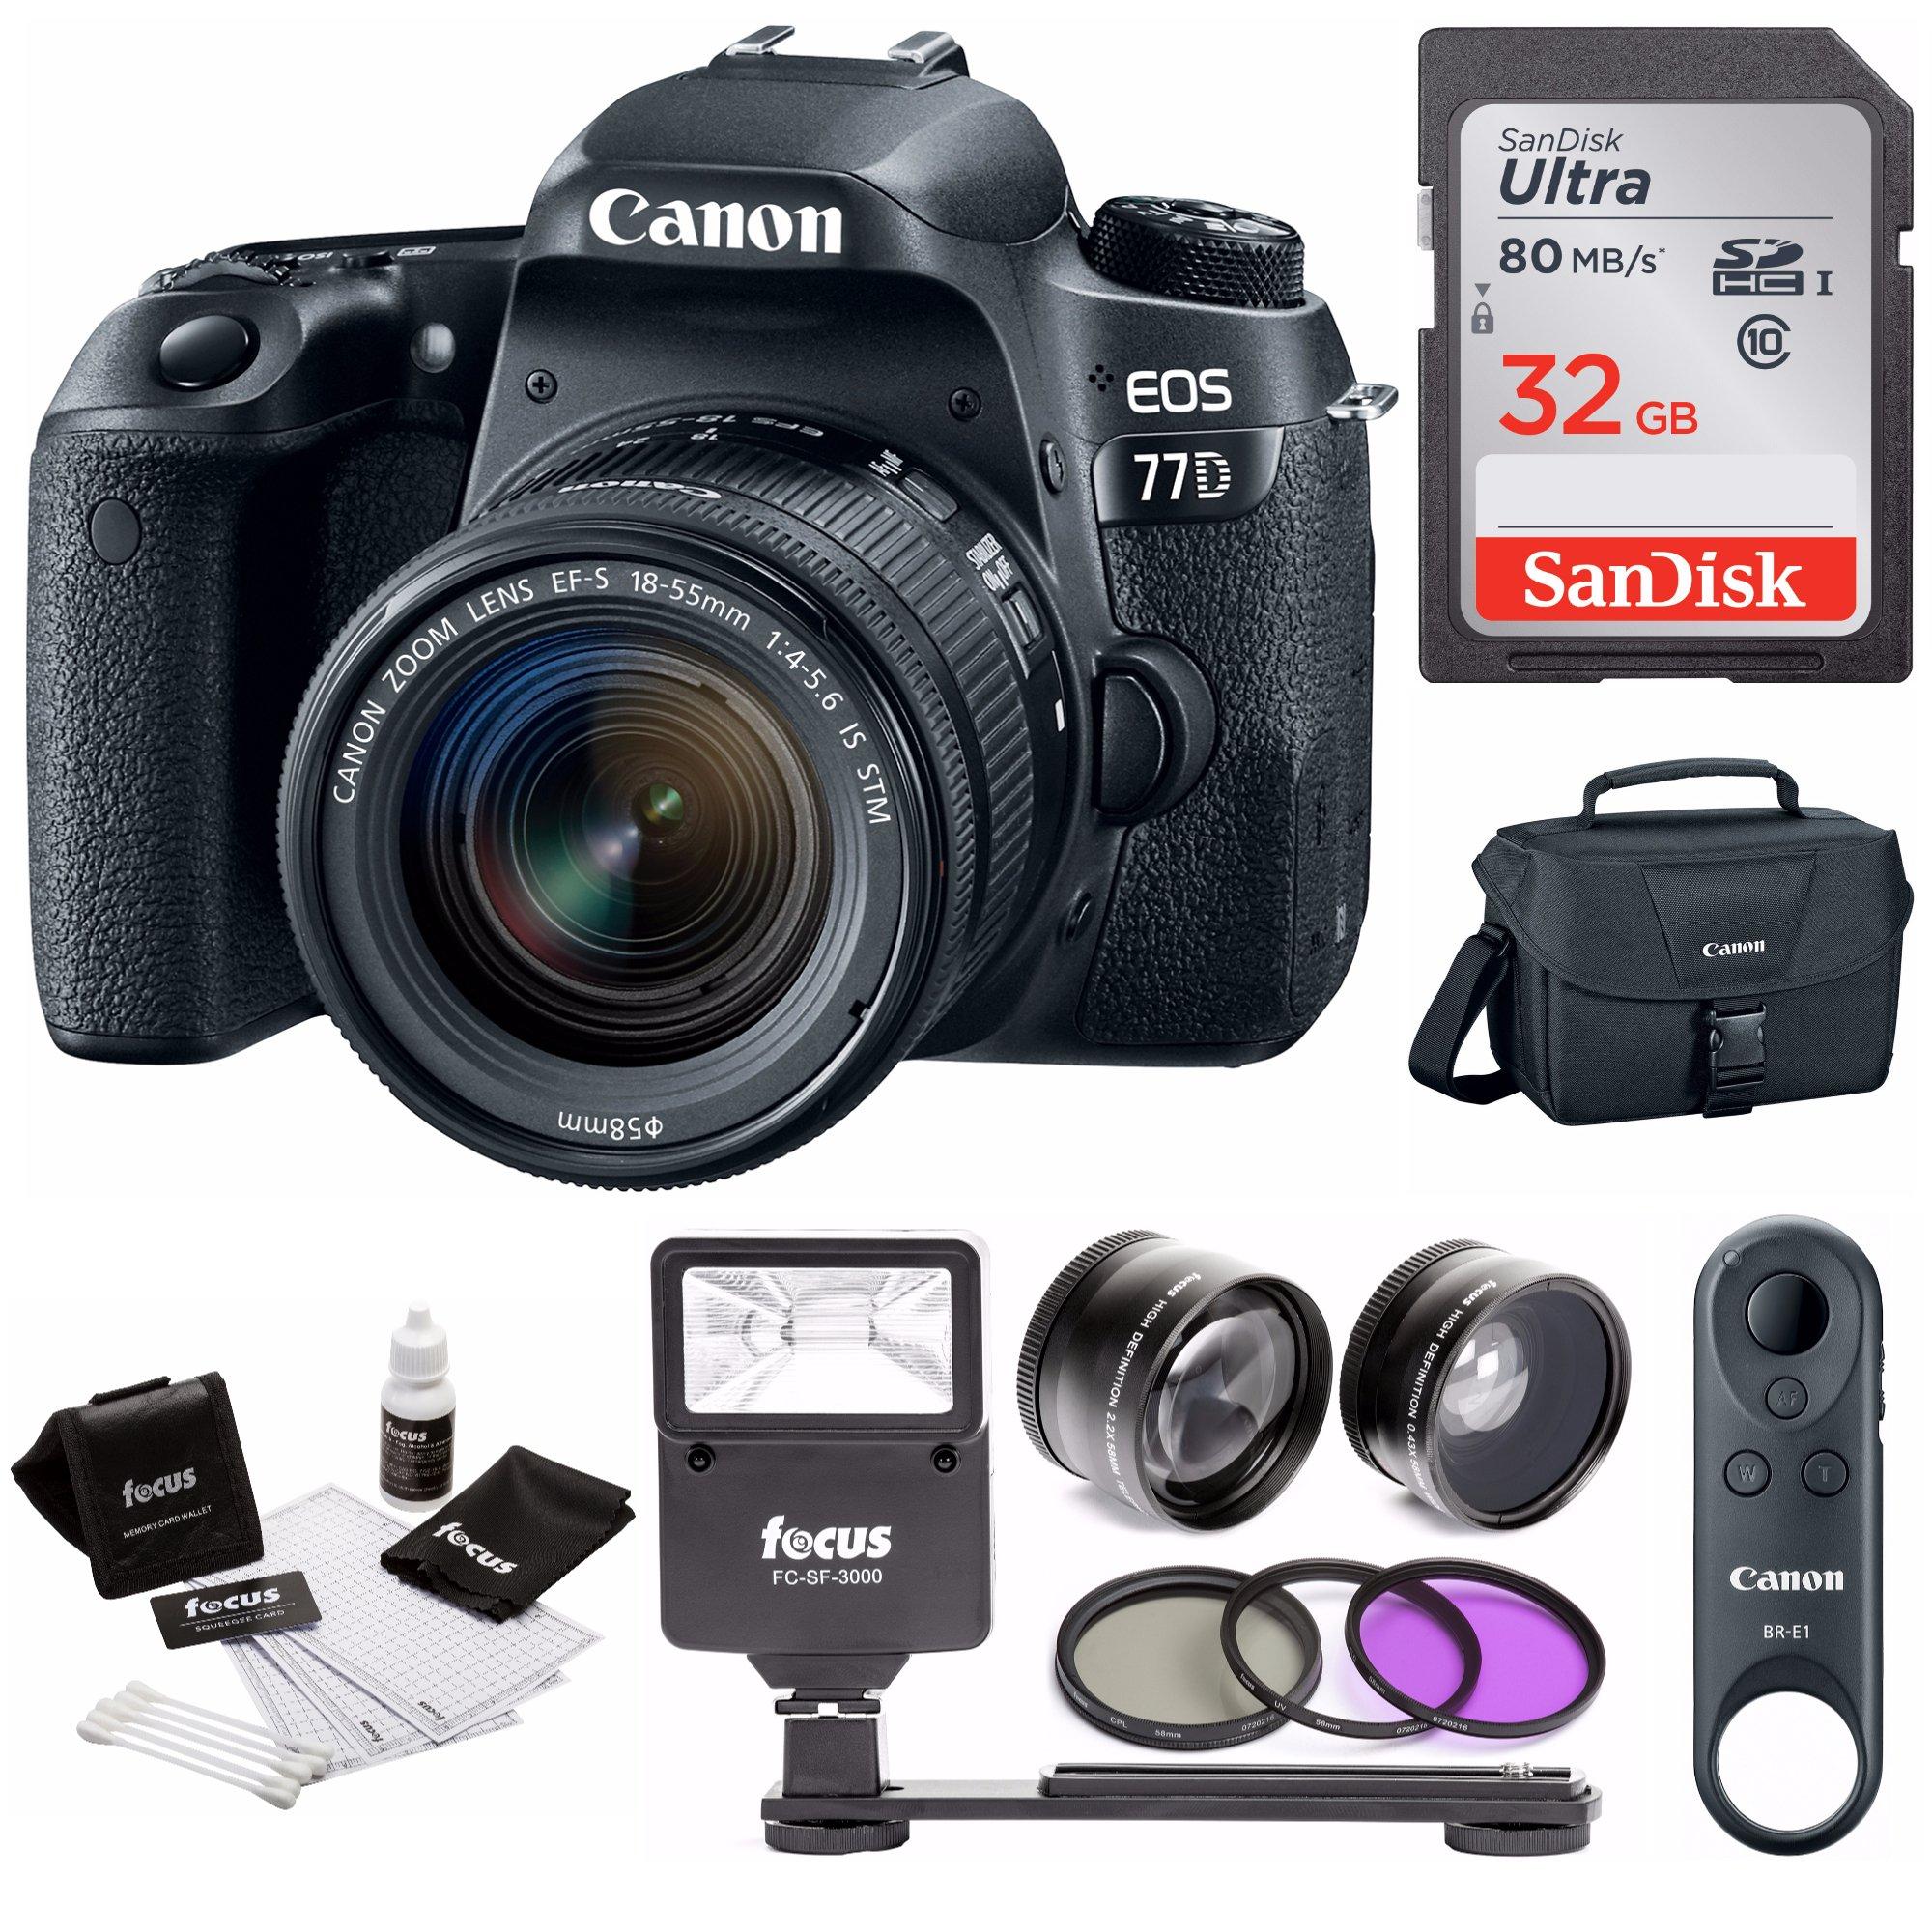 Canon EOS 77D DSLR with 18-55mm Lens & BR-E1 Remote Control + Flash & 32GB Bundle by Focus Camera